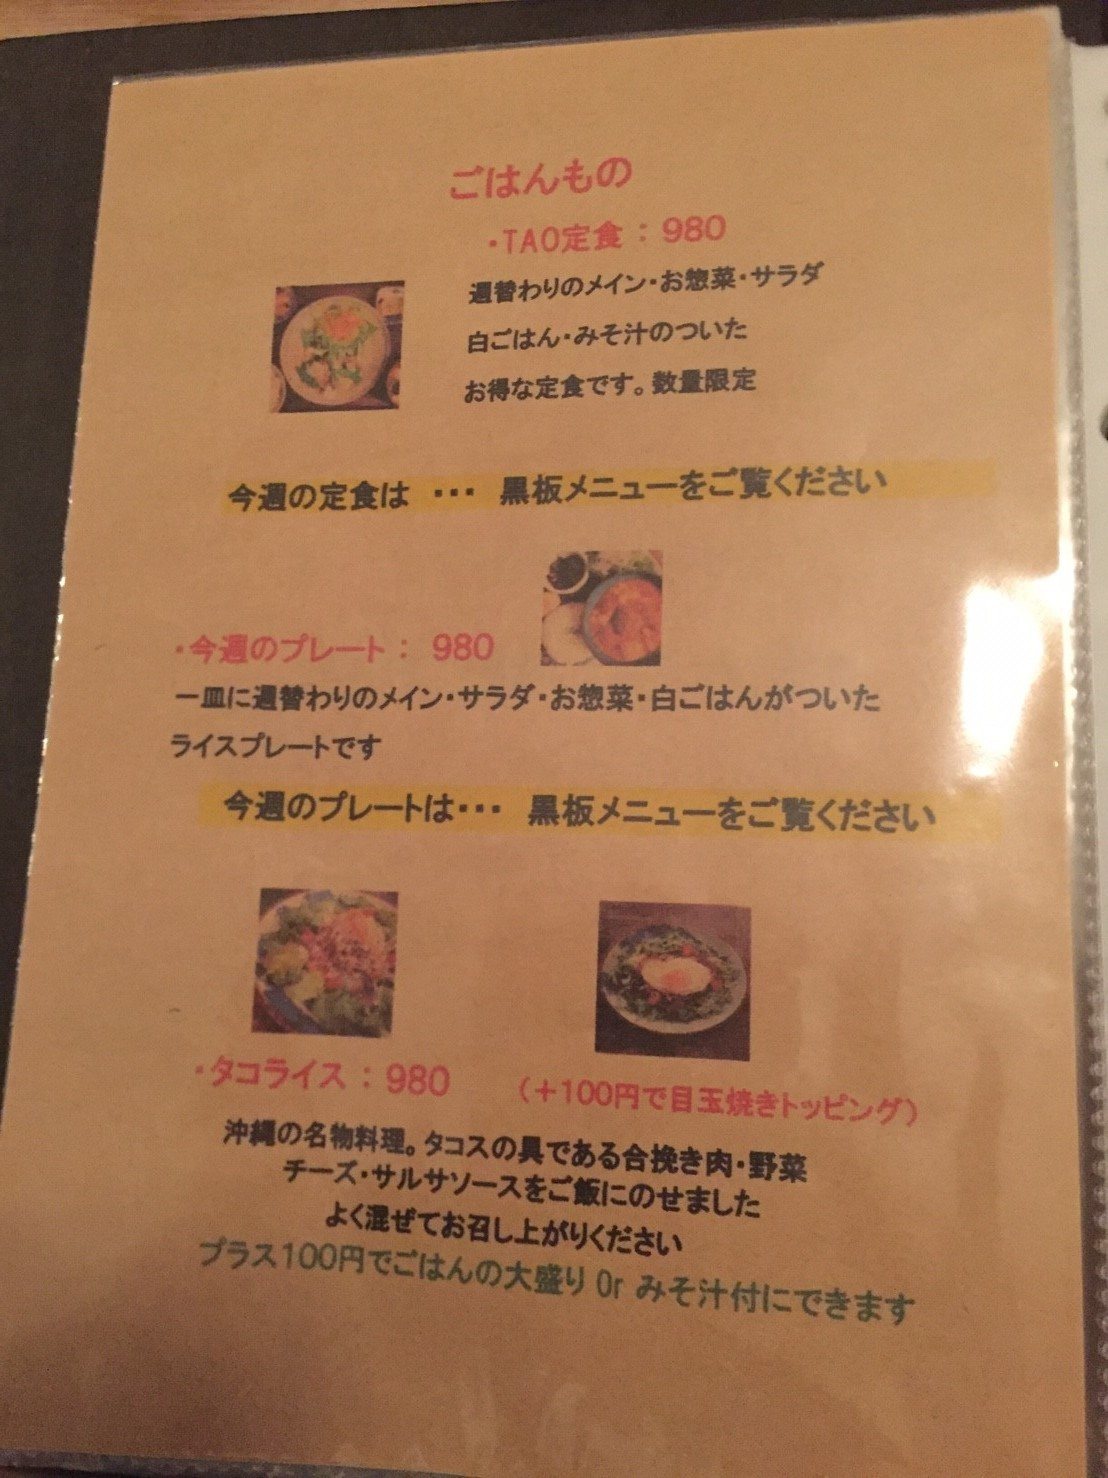 TAO CAFE にて夕食_e0115904_02270635.jpg